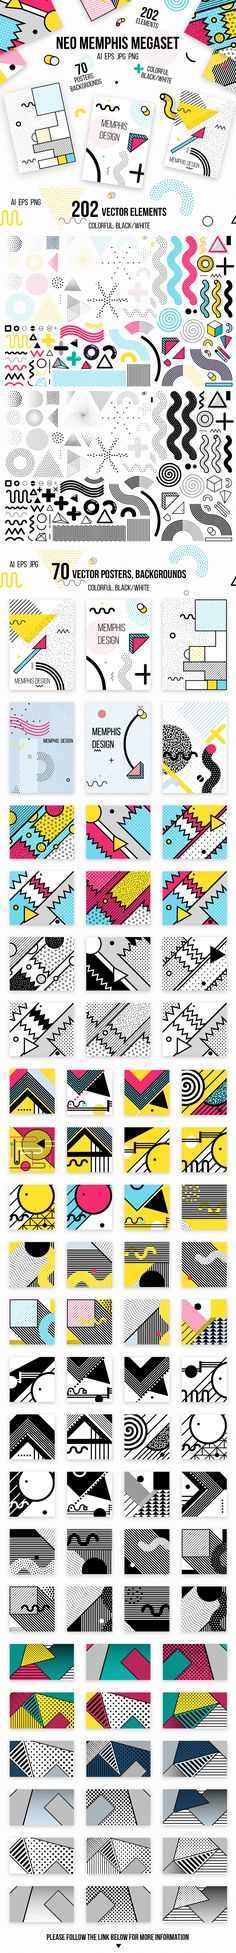 "Check out this @Behance project: ""272 patterns, posters, elements. MEMPHIS MEGAset"" https://www.behance.net/gallery/46513541/272-patterns-posters-elements-MEMPHIS-MEGAset"